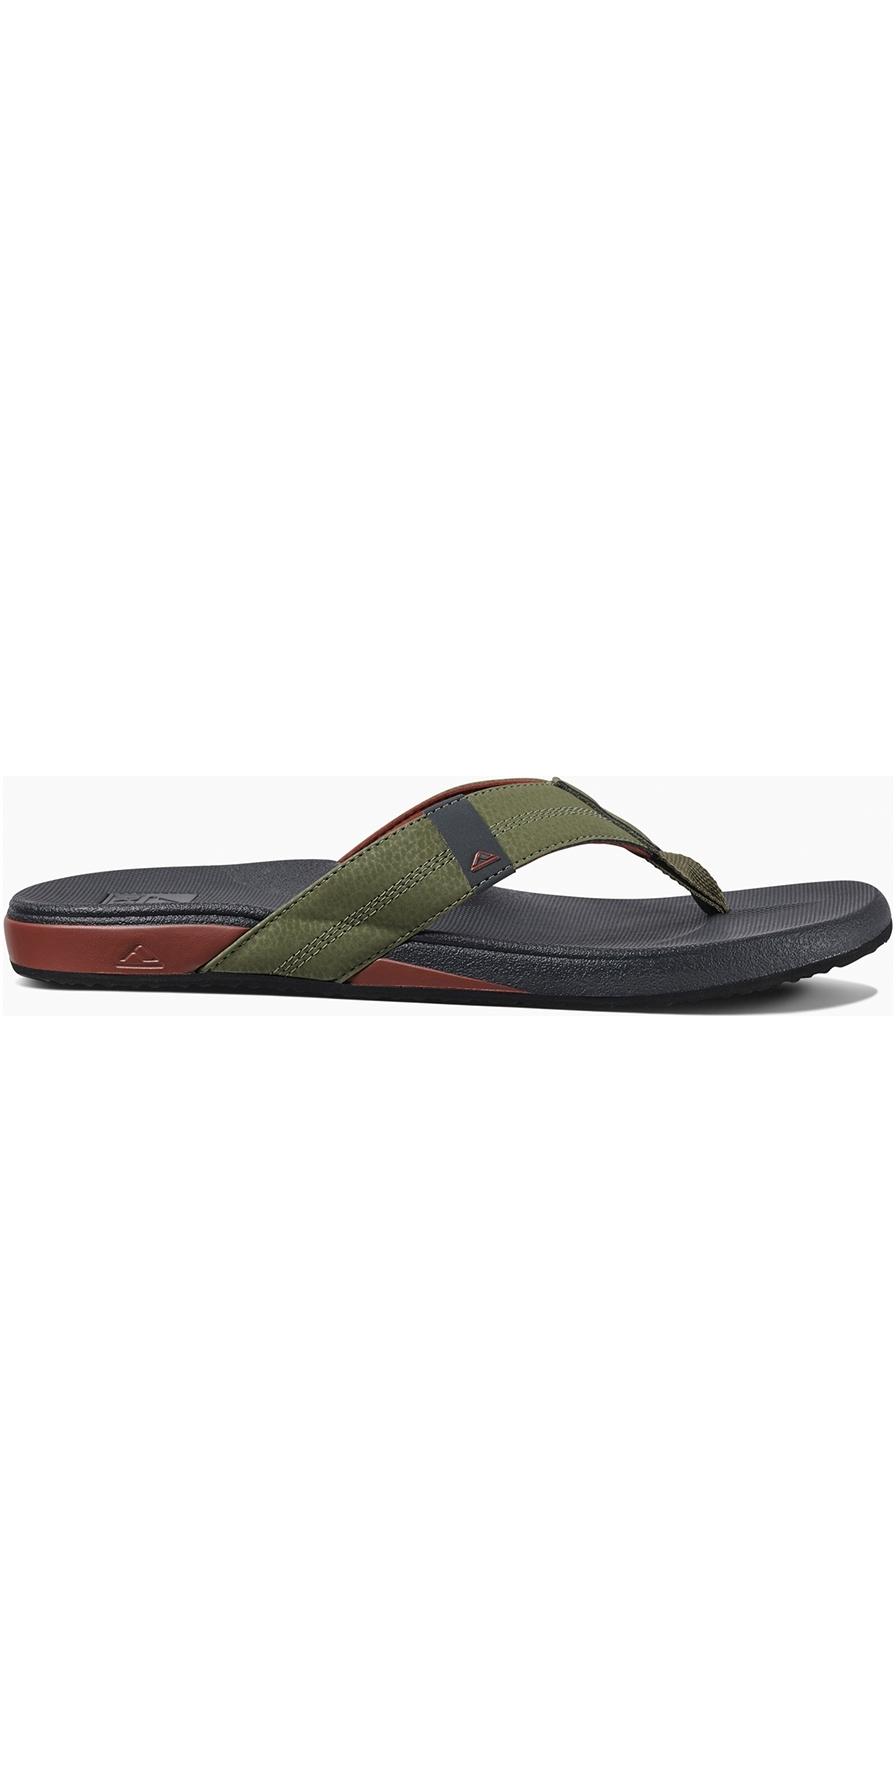 2019 Reef Mens Cushion Bounce Phantom Sandals Flip Flops Olive Red Rf0a3fdi